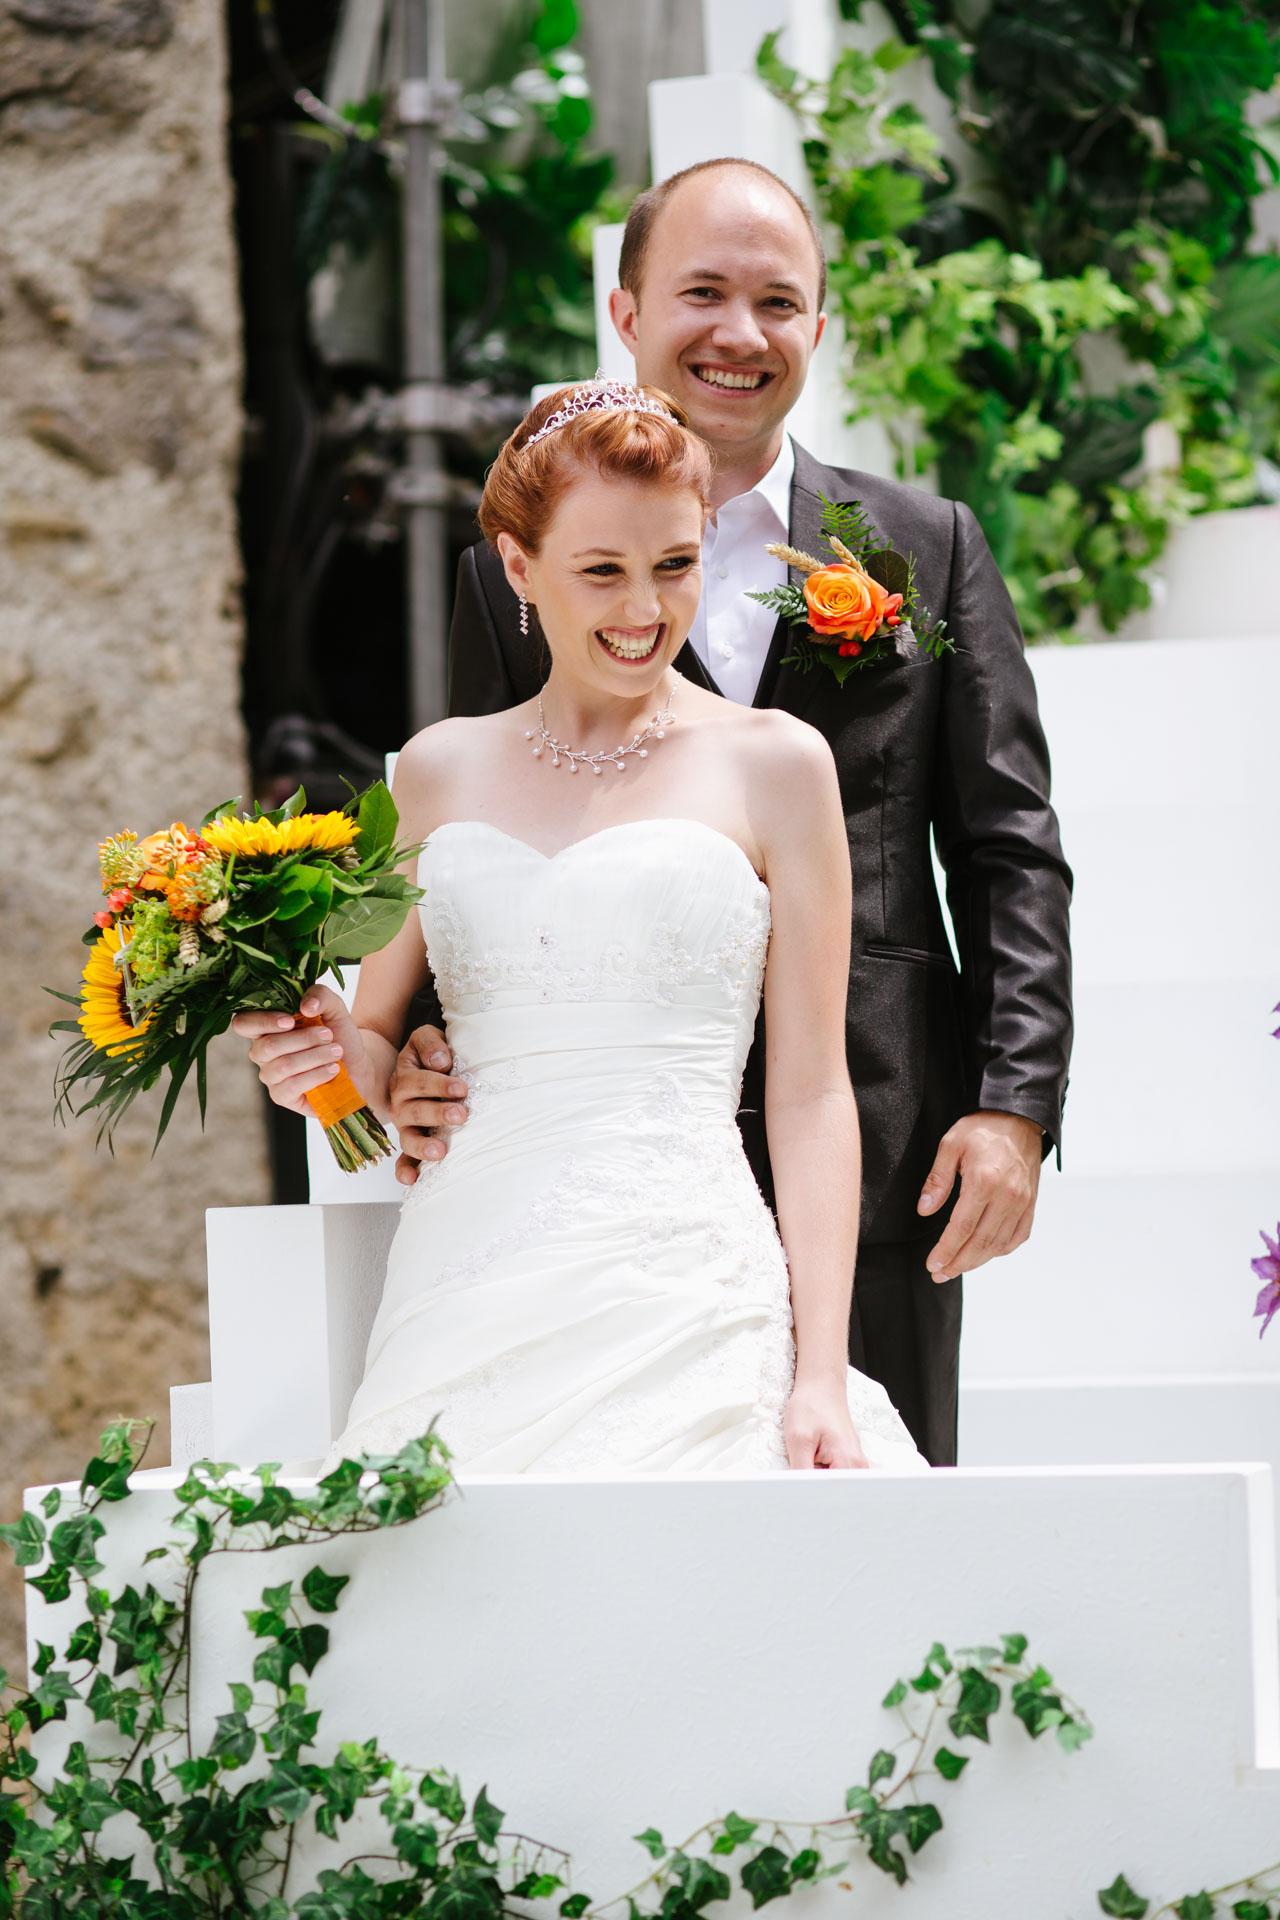 Pixelart_Hochzeitsfotografen_Loerrach_Rheinfelden_Hallwil_Schweiz_Linda-Ramon-1007